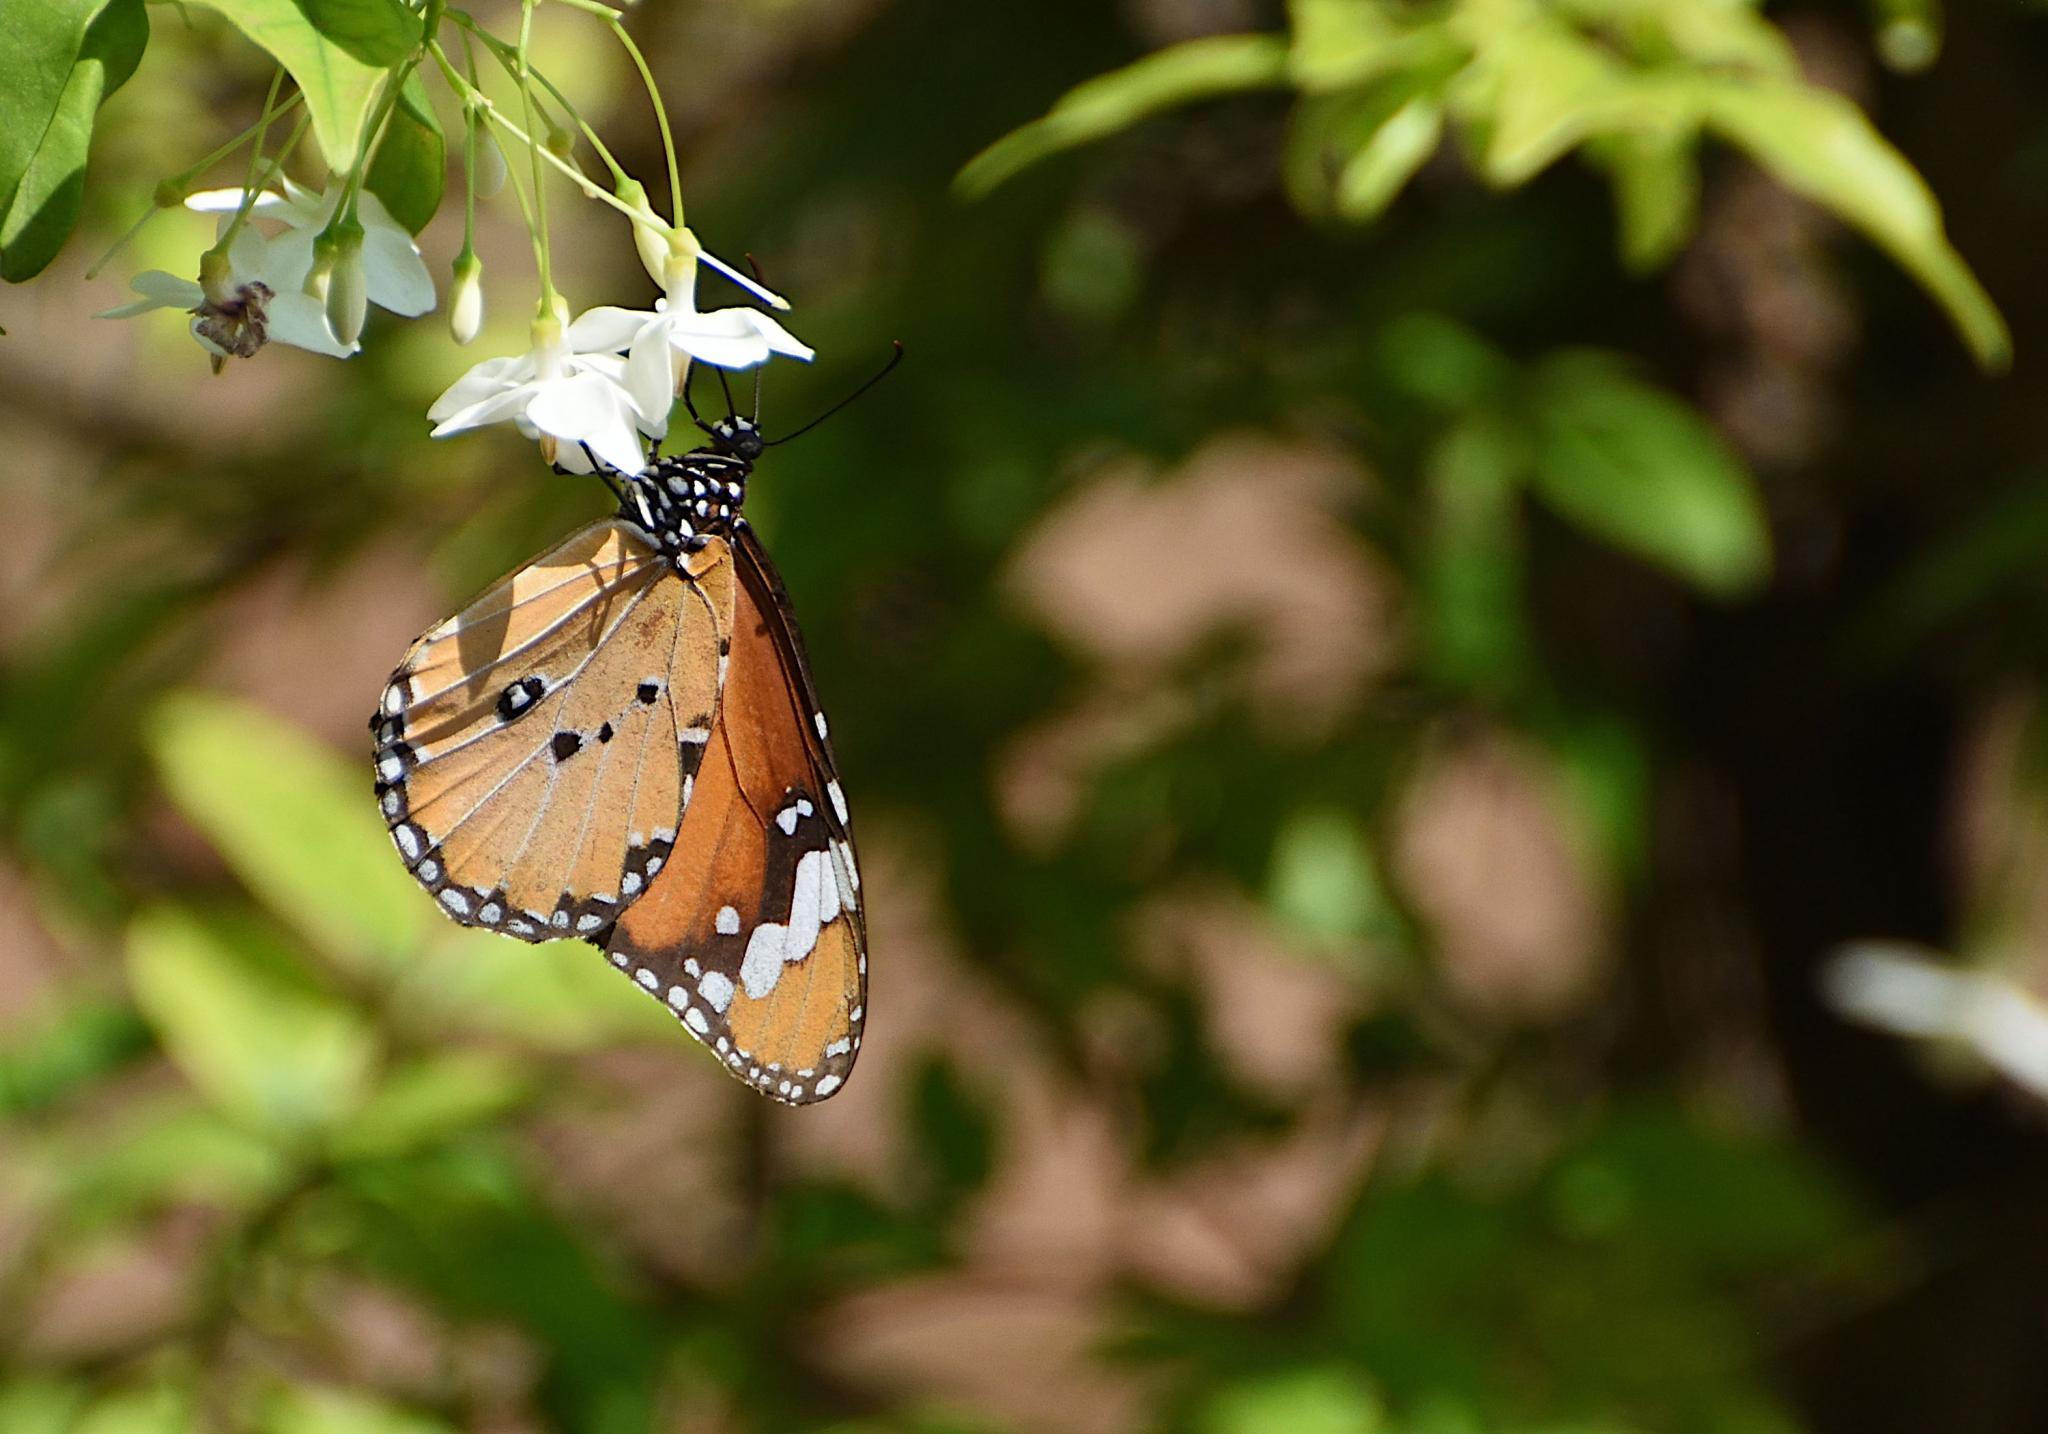 Thai Butterfly Photos-plain_tiger_1491_01-jpg